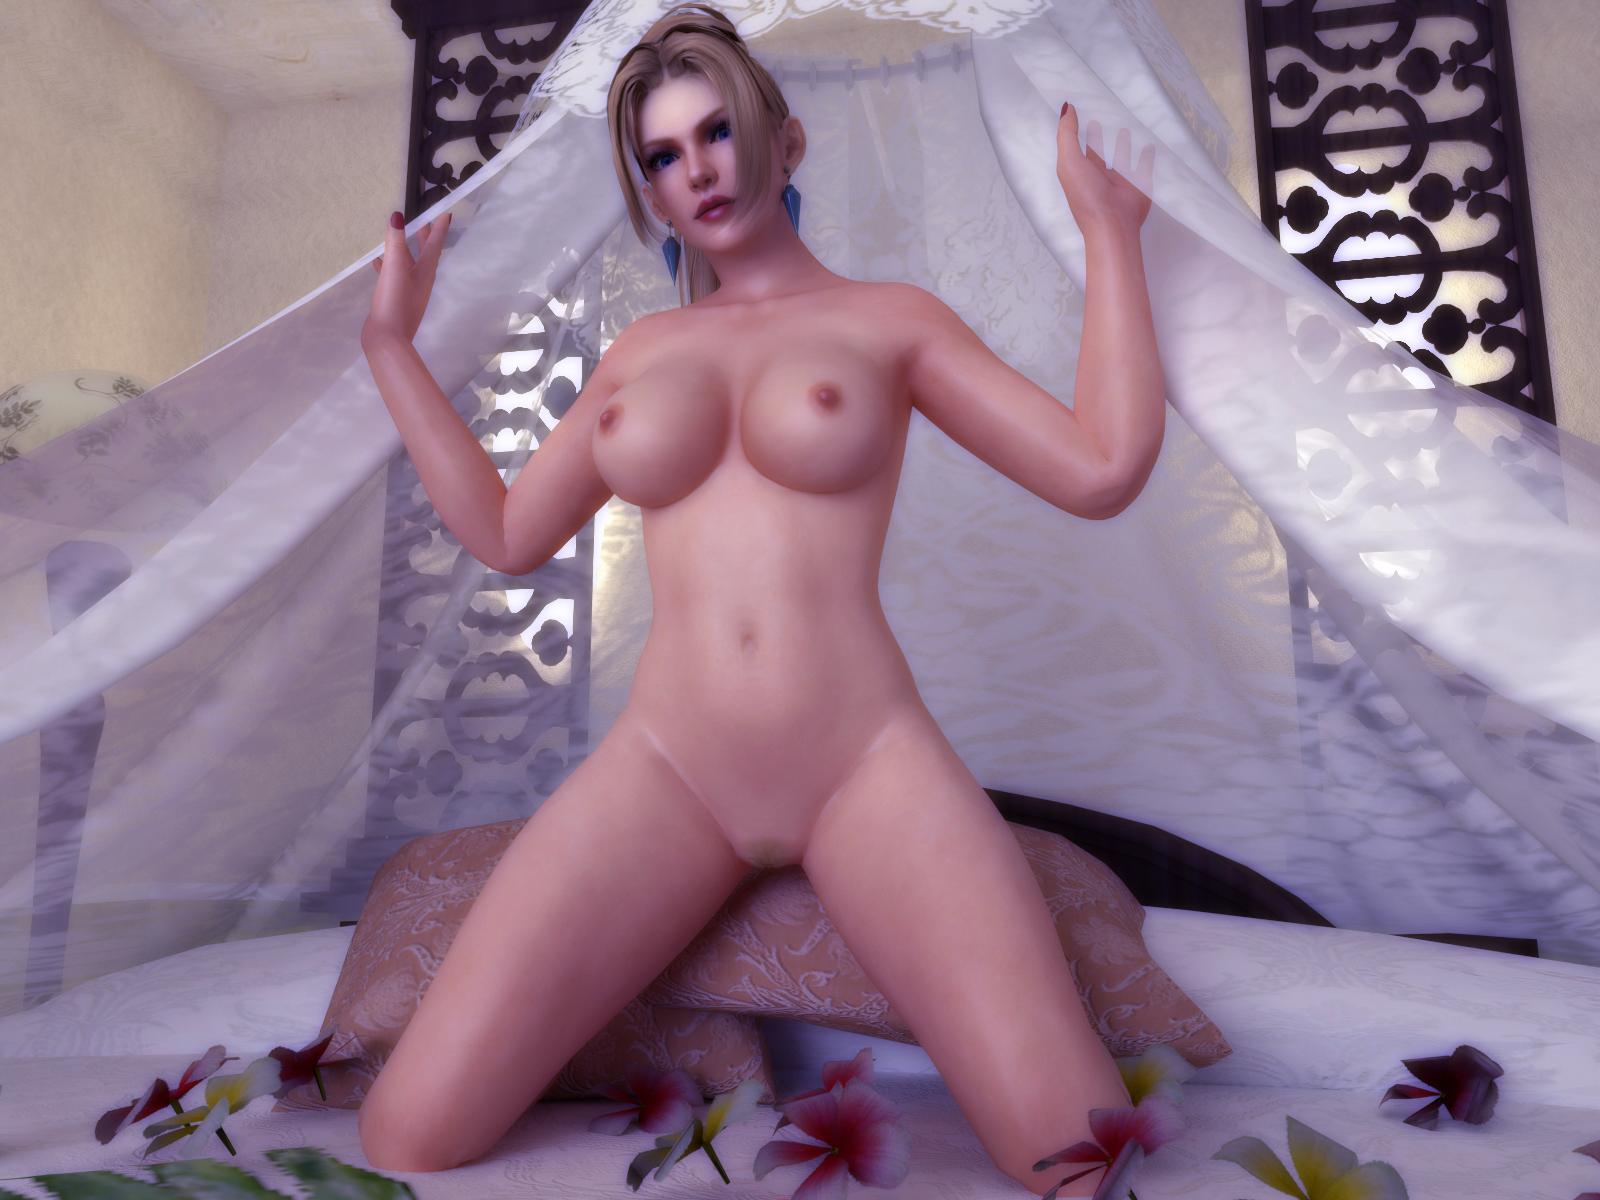 emmie-model naked 1